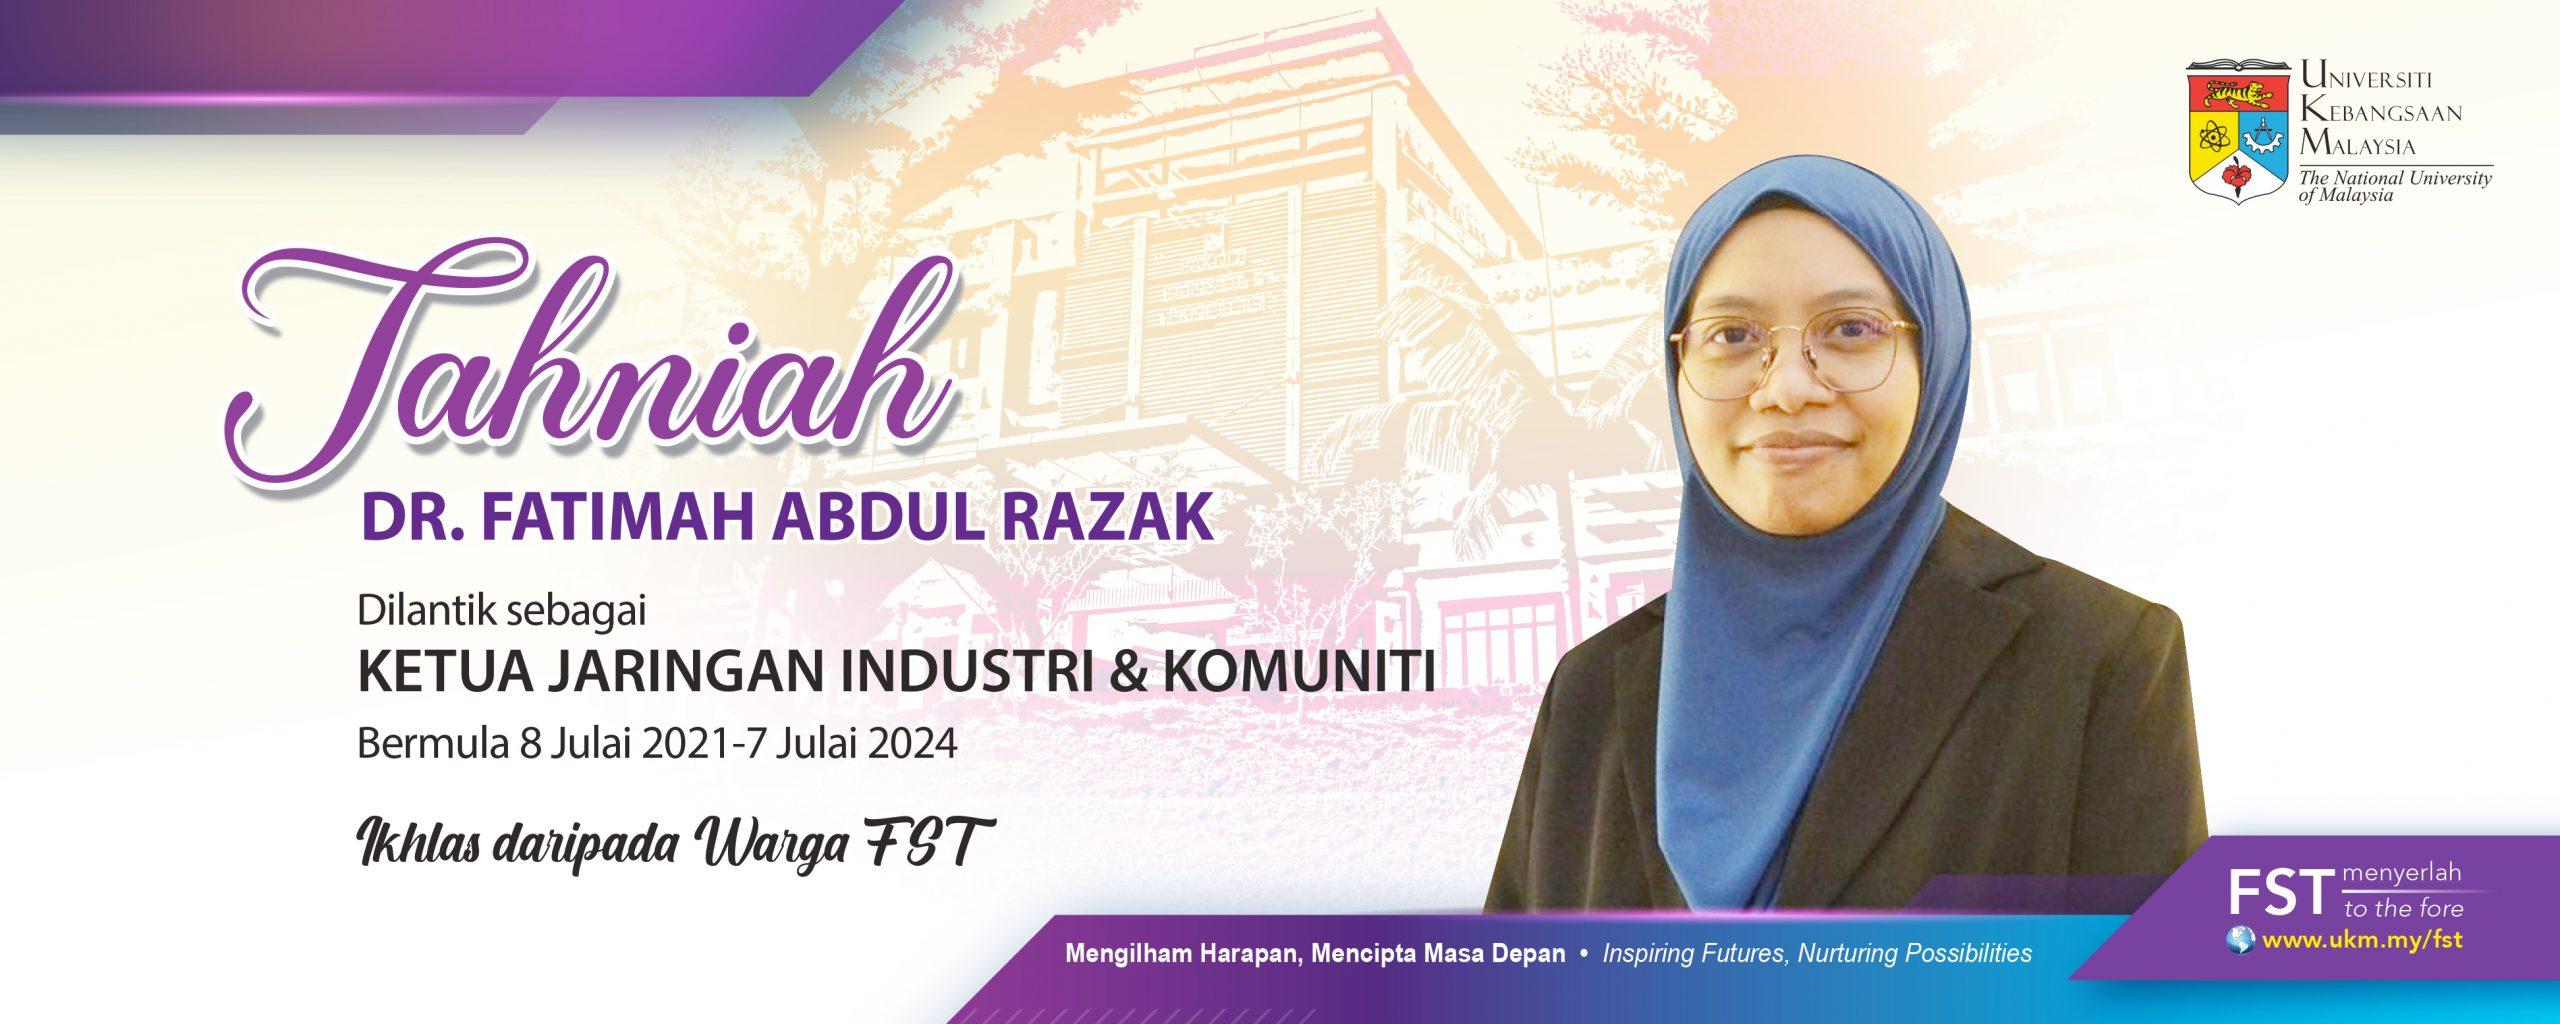 Tahniah Dr. Fatimah